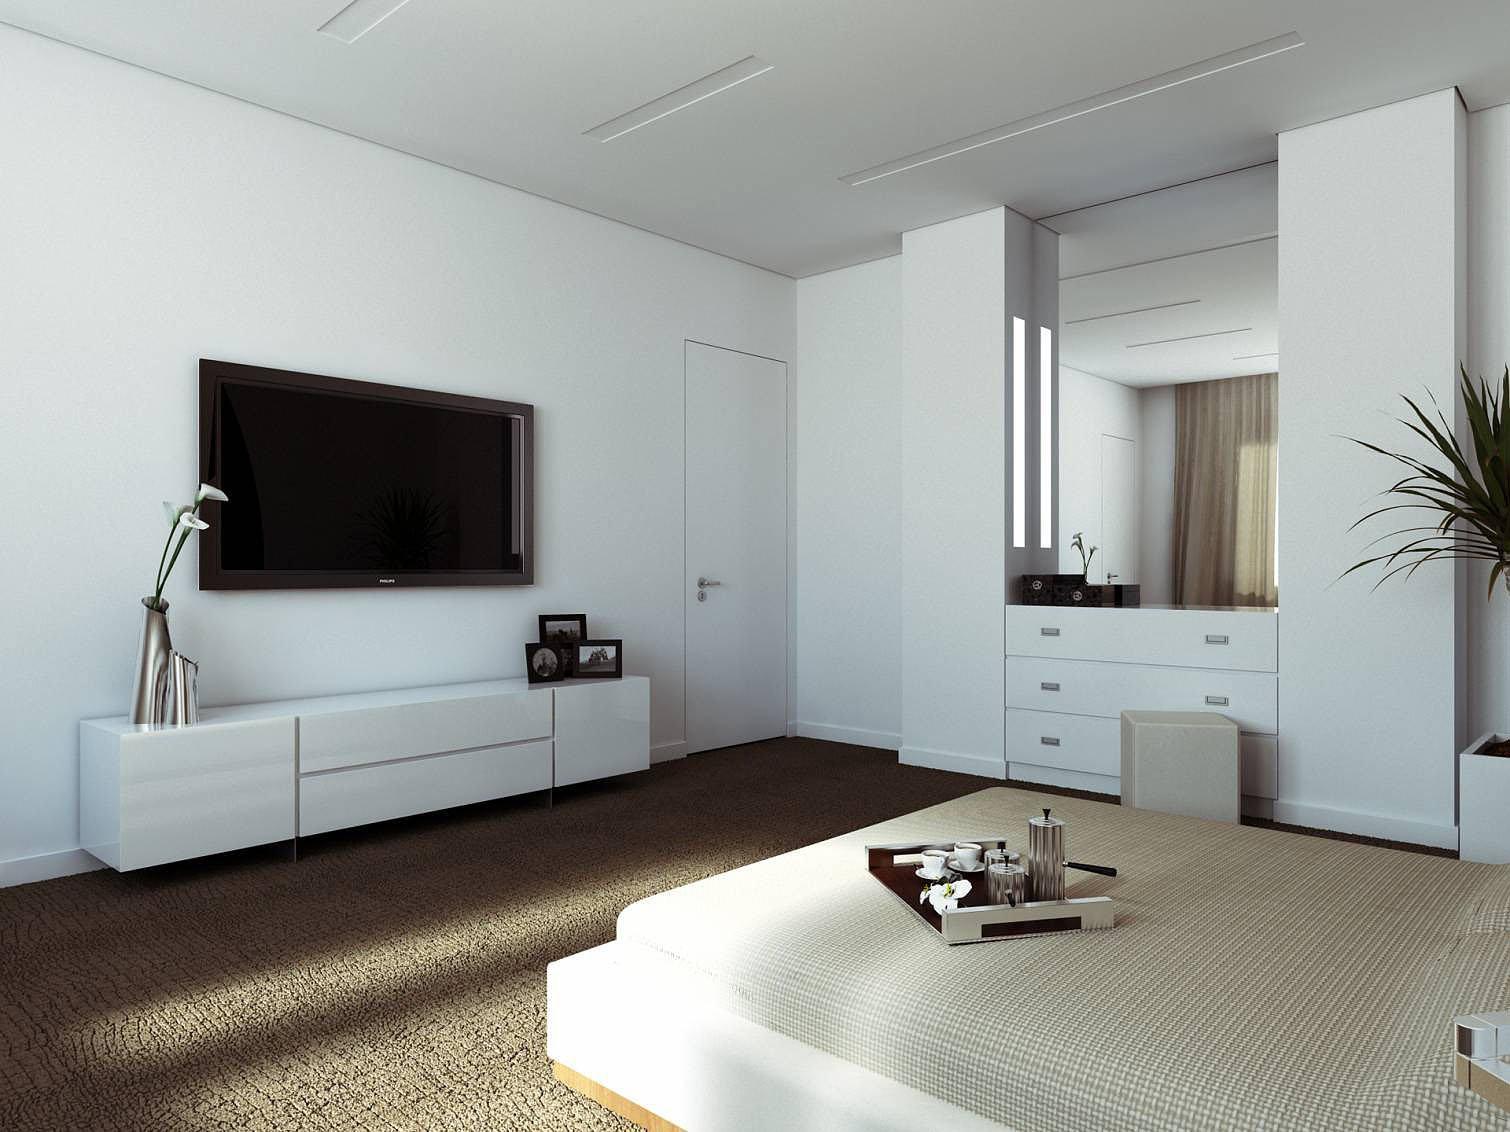 Apartment-Design-in-Moskovyan-Plaza-11